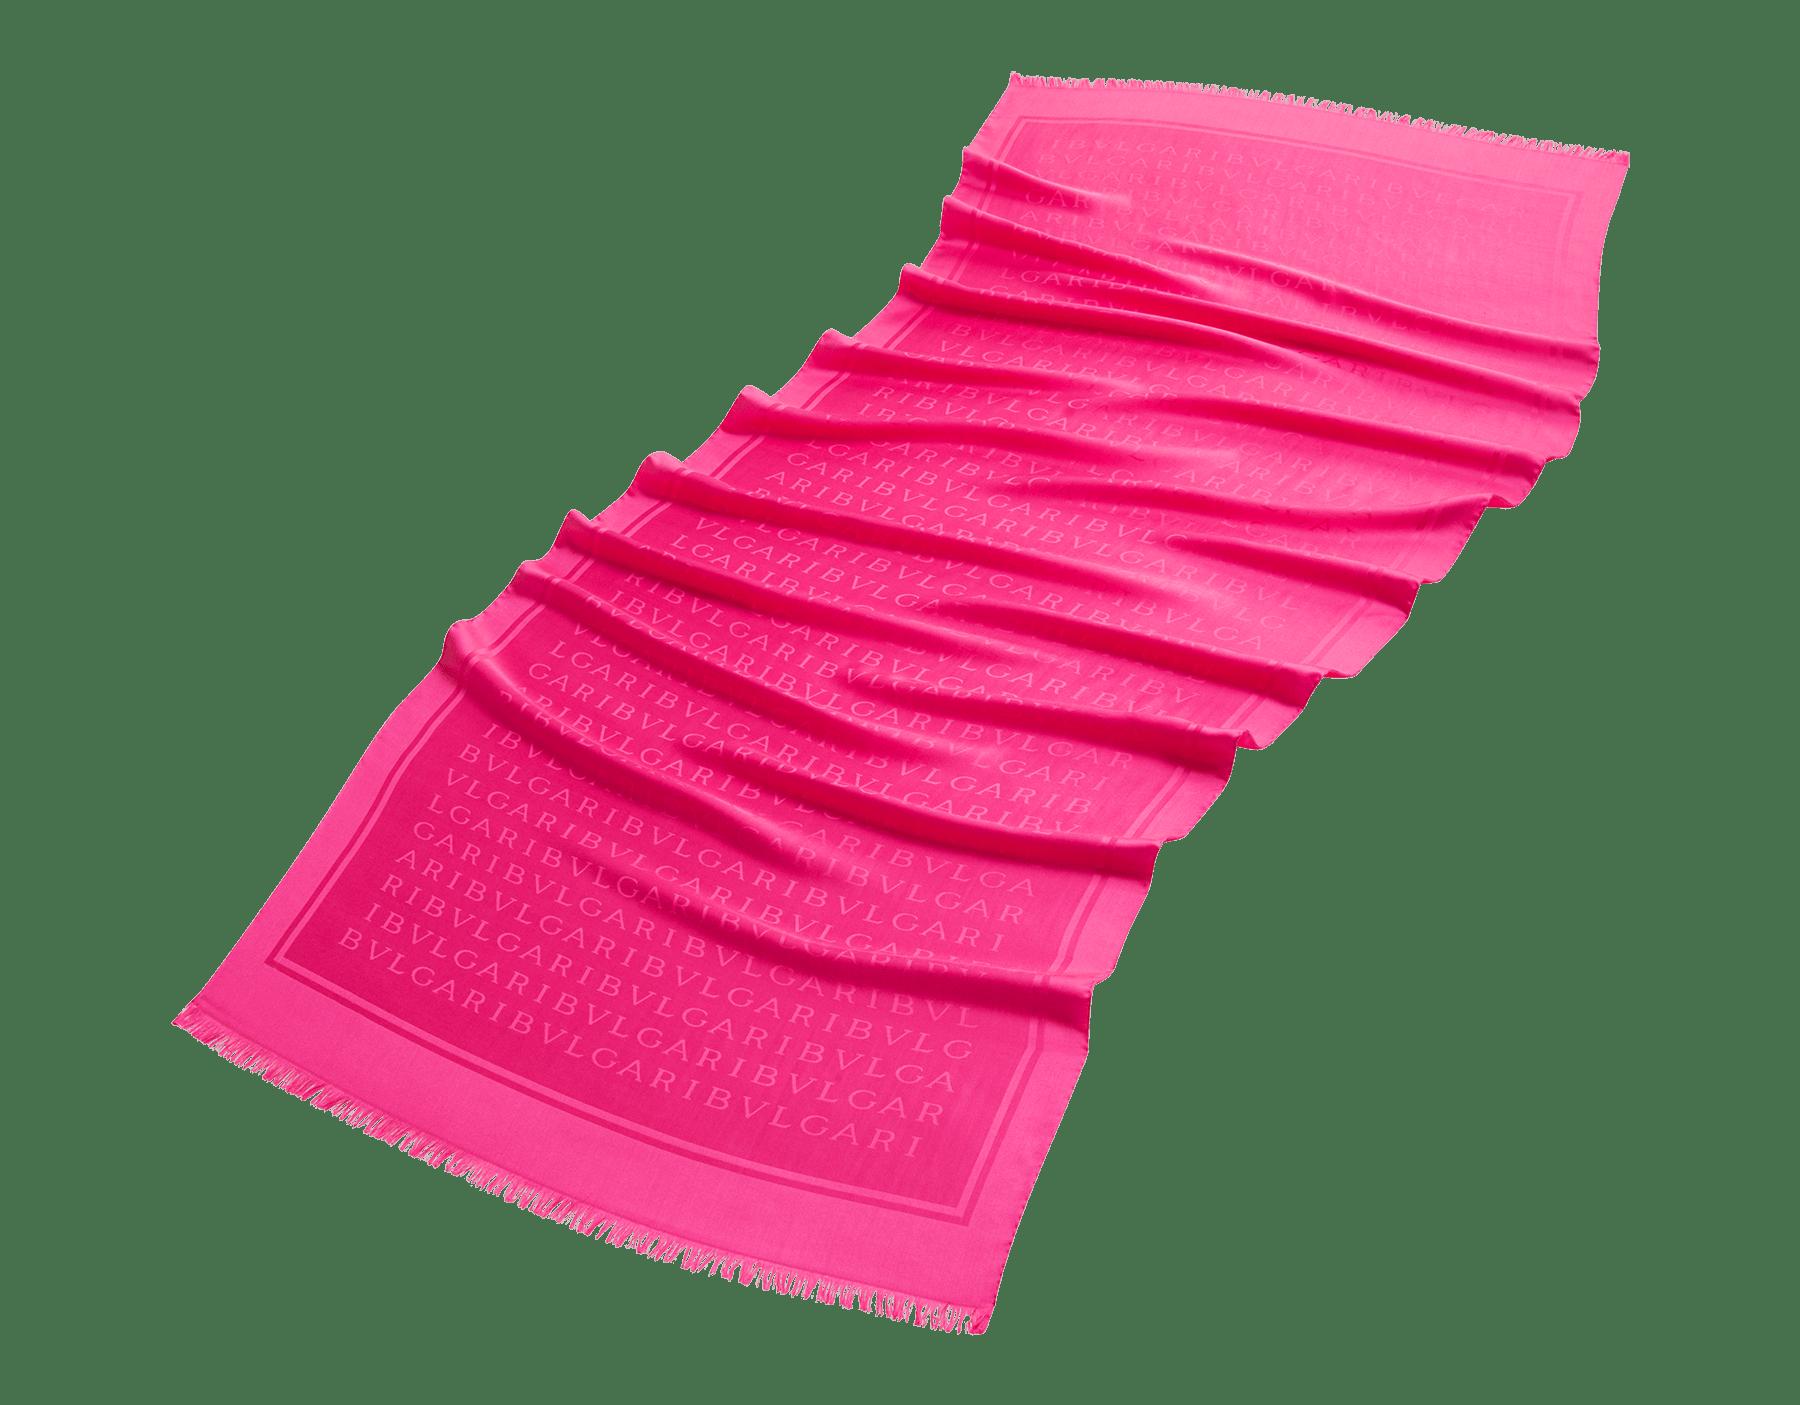 """Lettere Maxi Light"" Stola in pinkem Flash Amethyst aus feiner Seide. 244052 image 2"